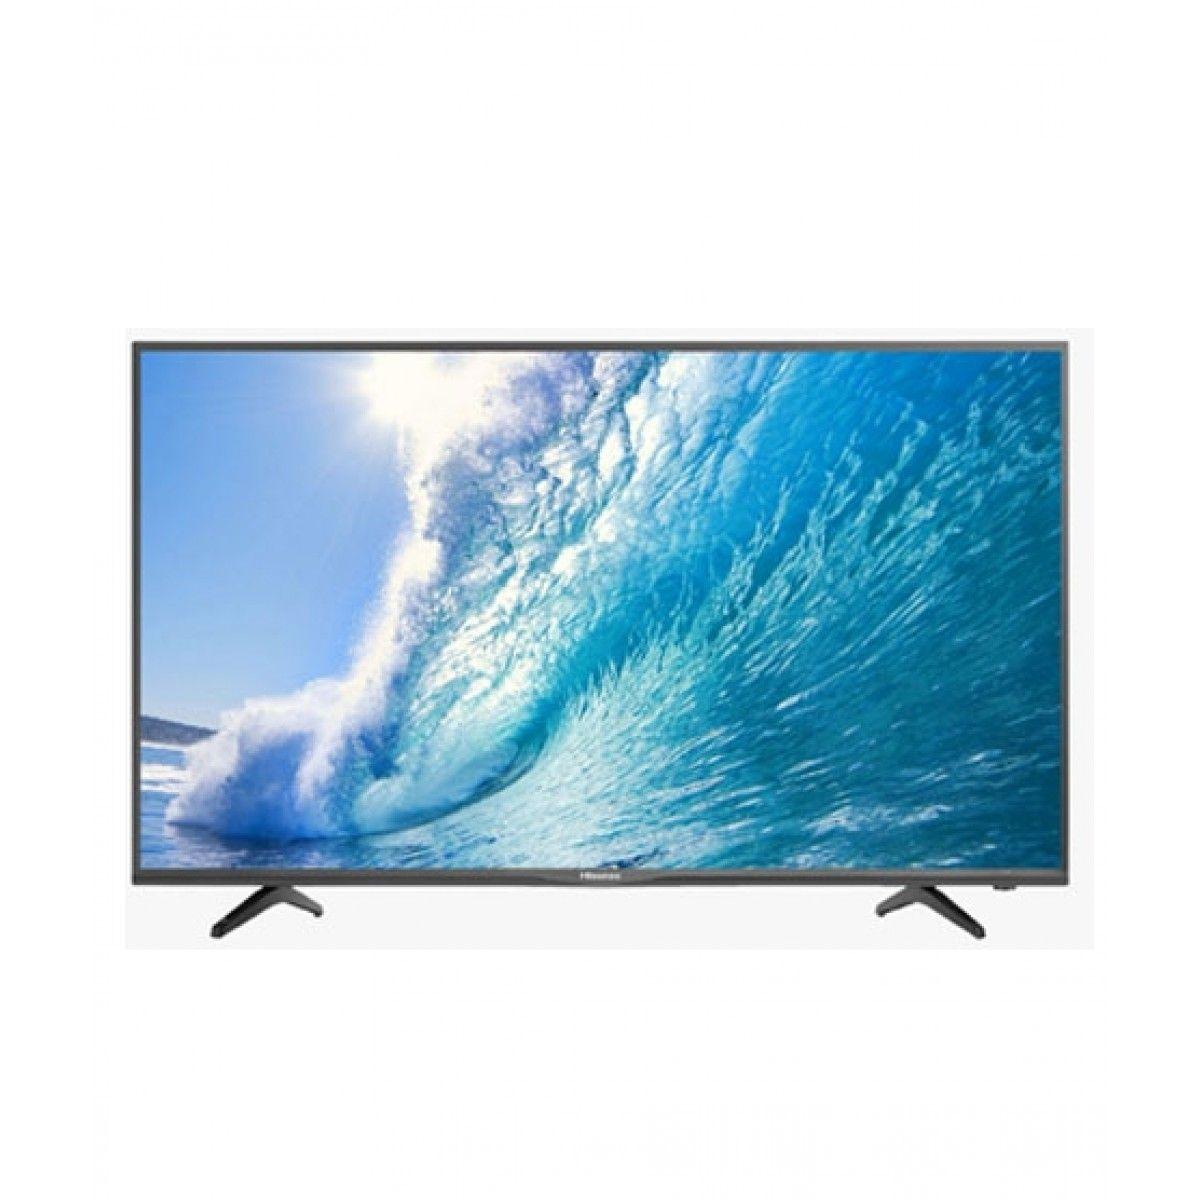 "Hisense 49"" 49N2179 SMART FULL HD LED TV"